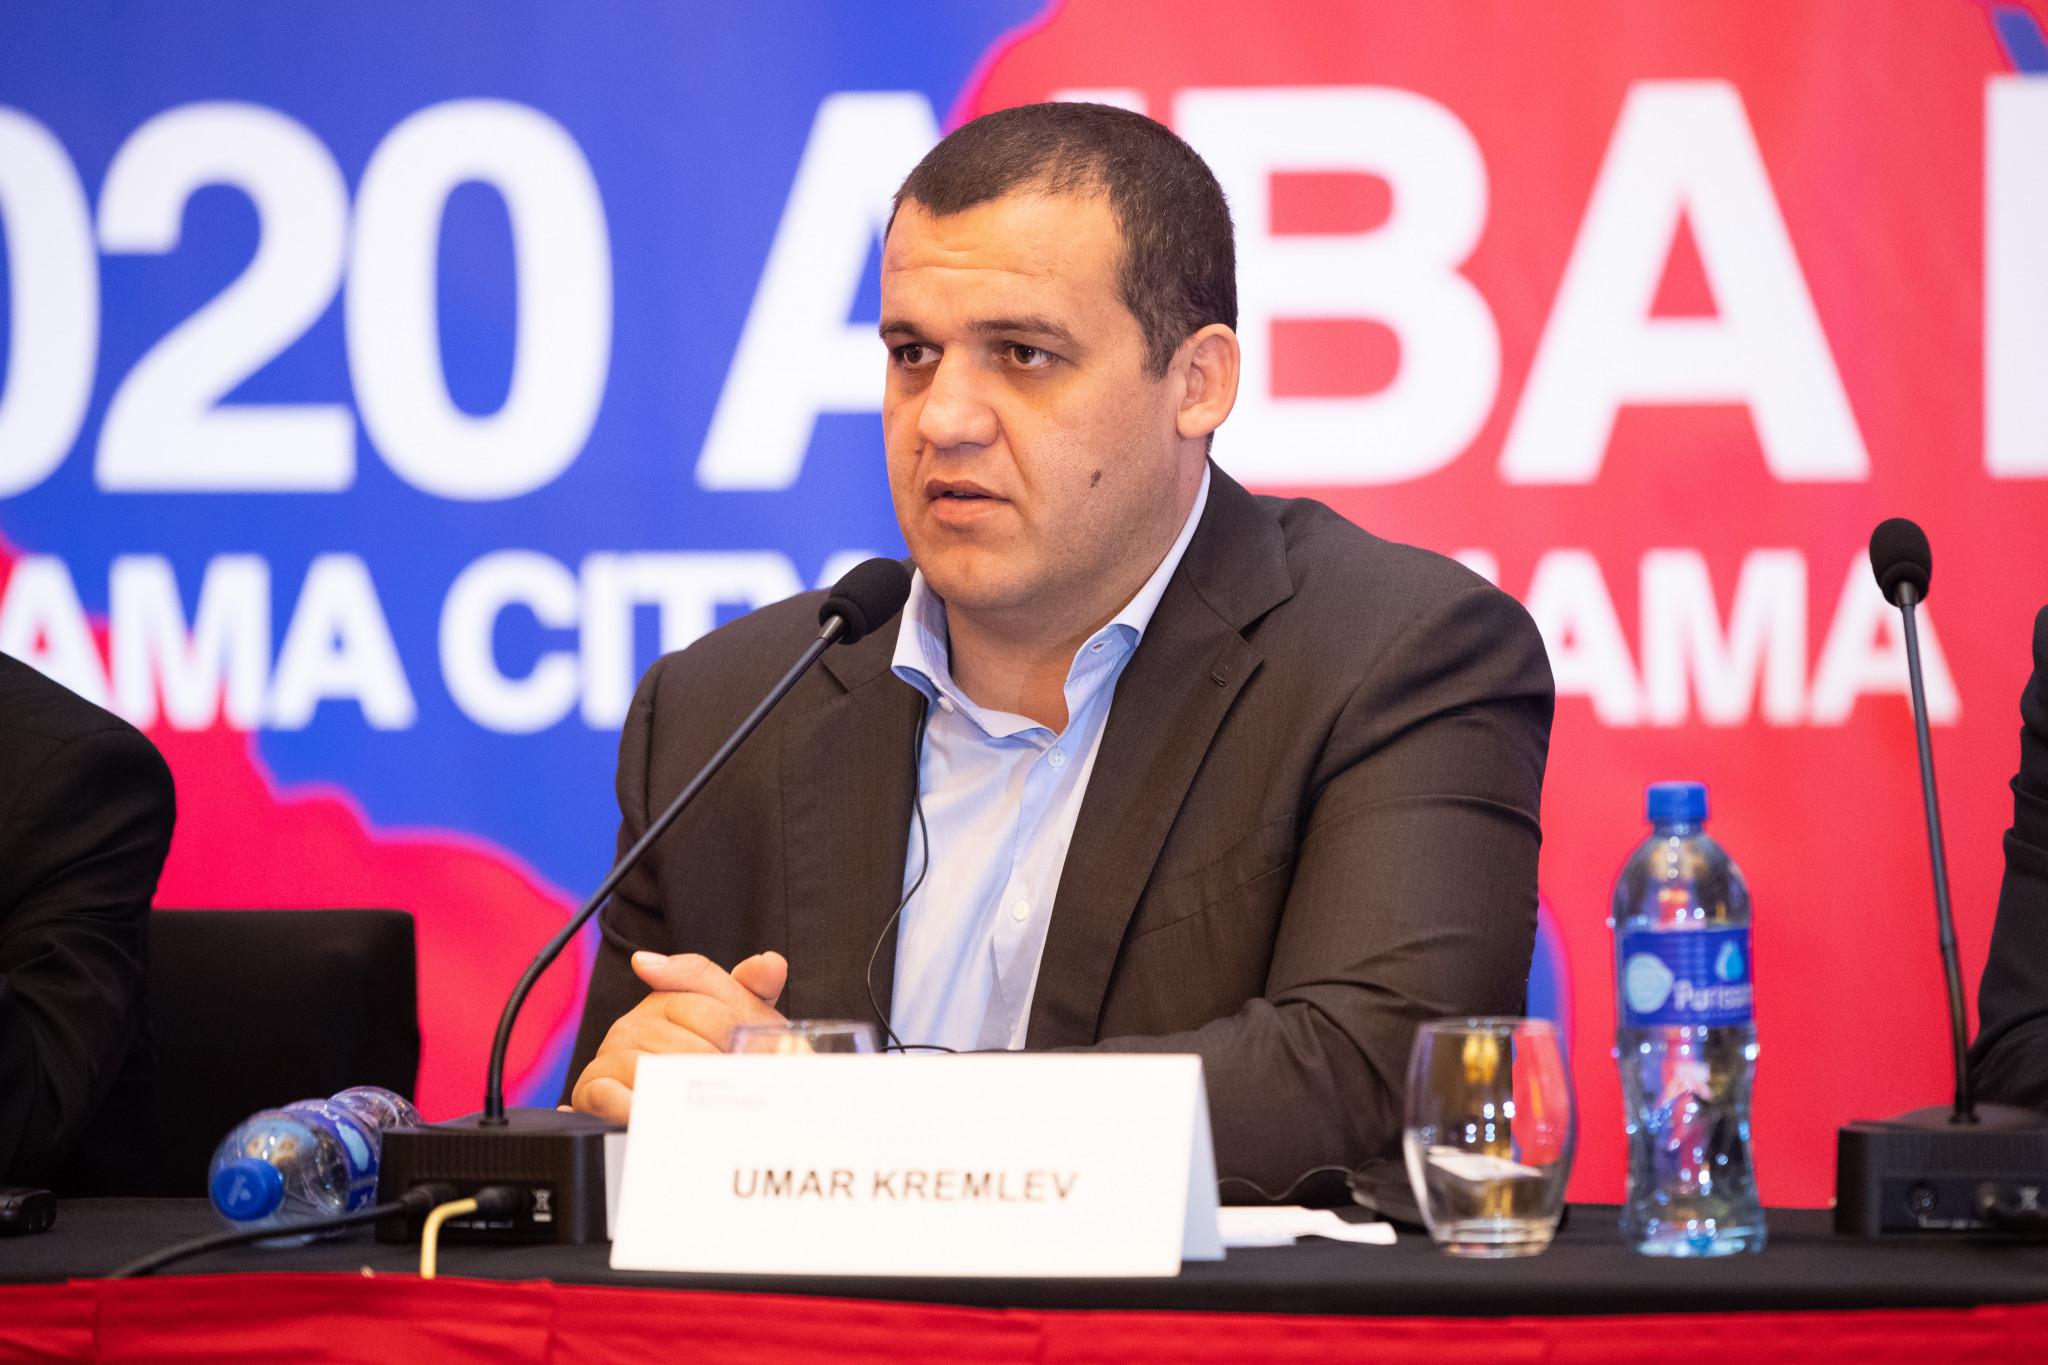 Umar Kremlev was elected AIBA President in December 2020 ©AIBA